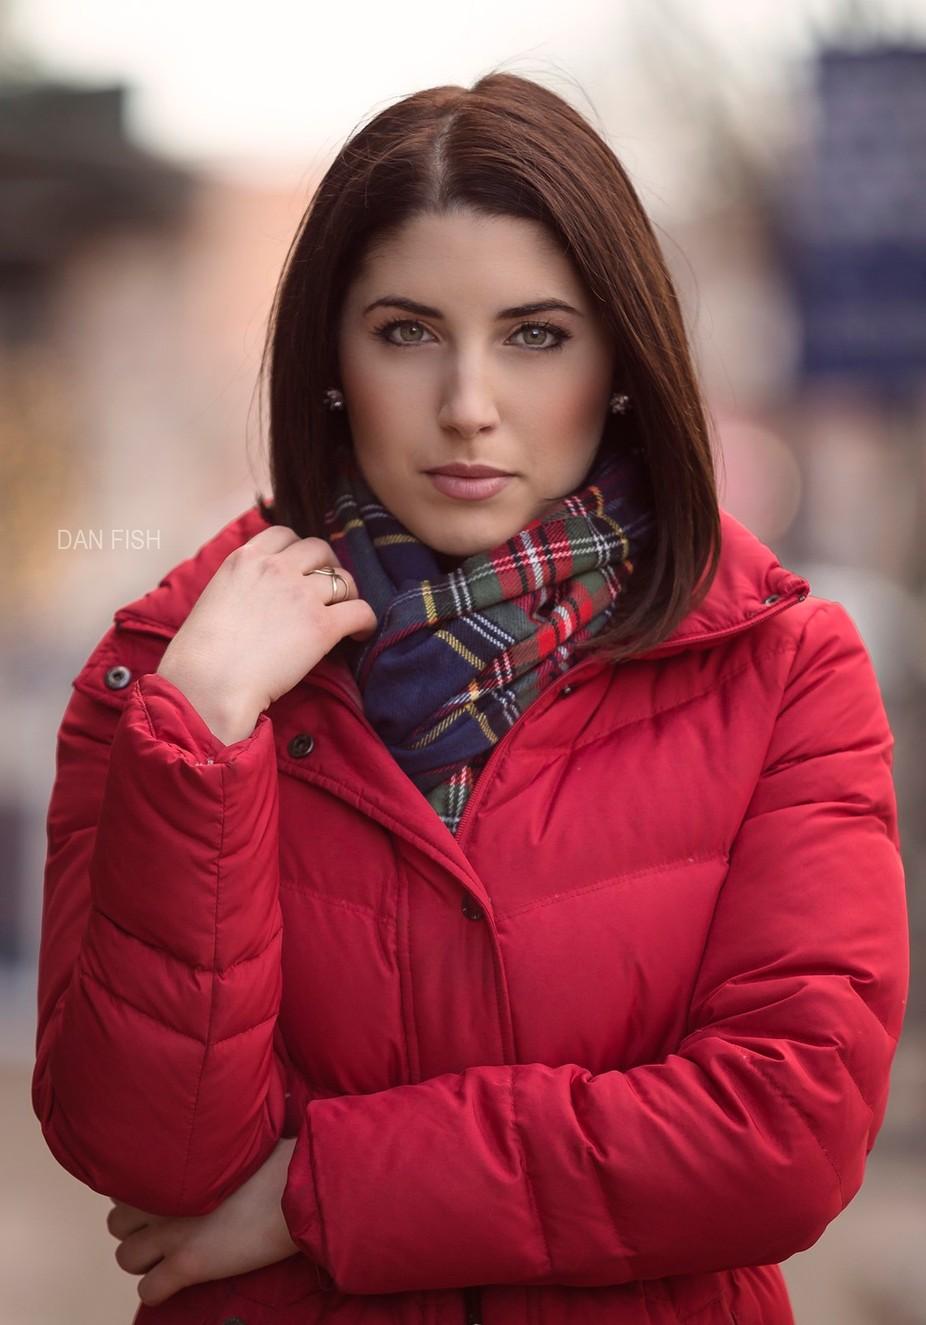 Katie by danfish - Celebrating Fashion Photo Contest